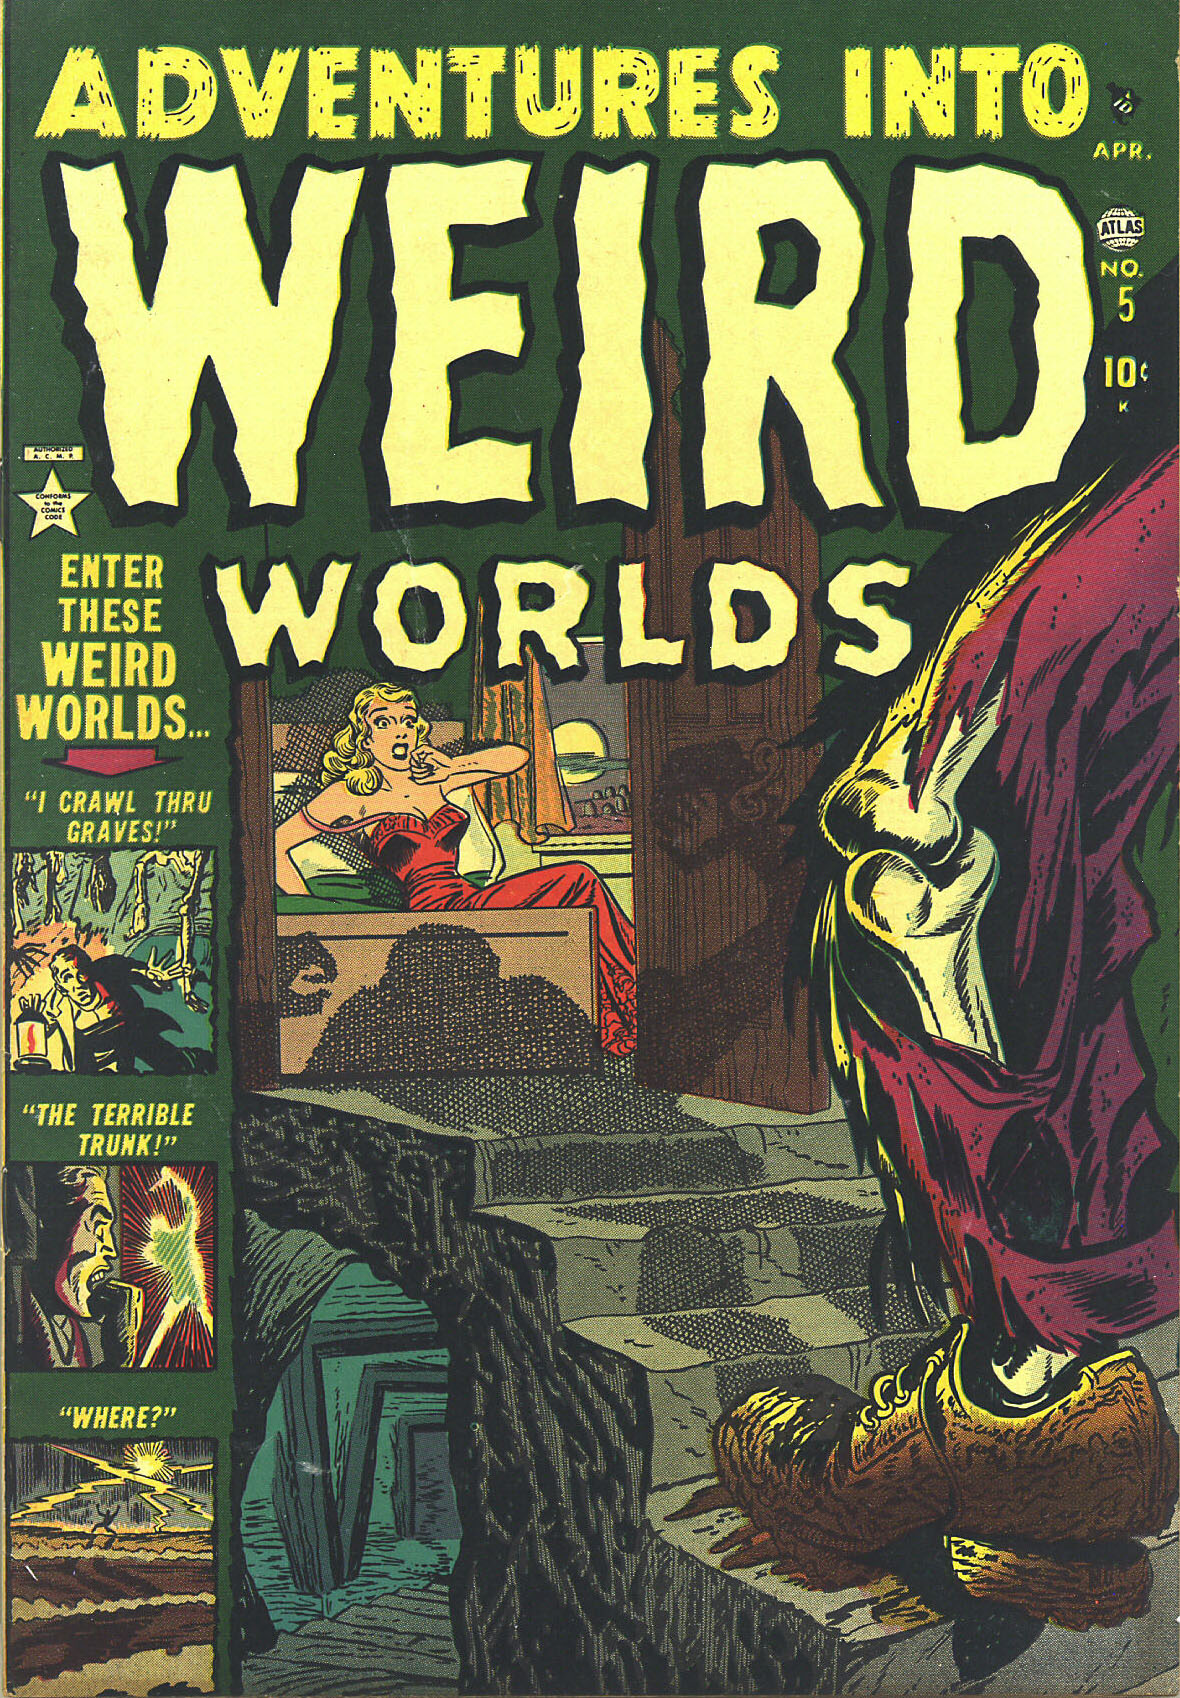 Read online Adventures into Weird Worlds comic -  Issue #5 - 1